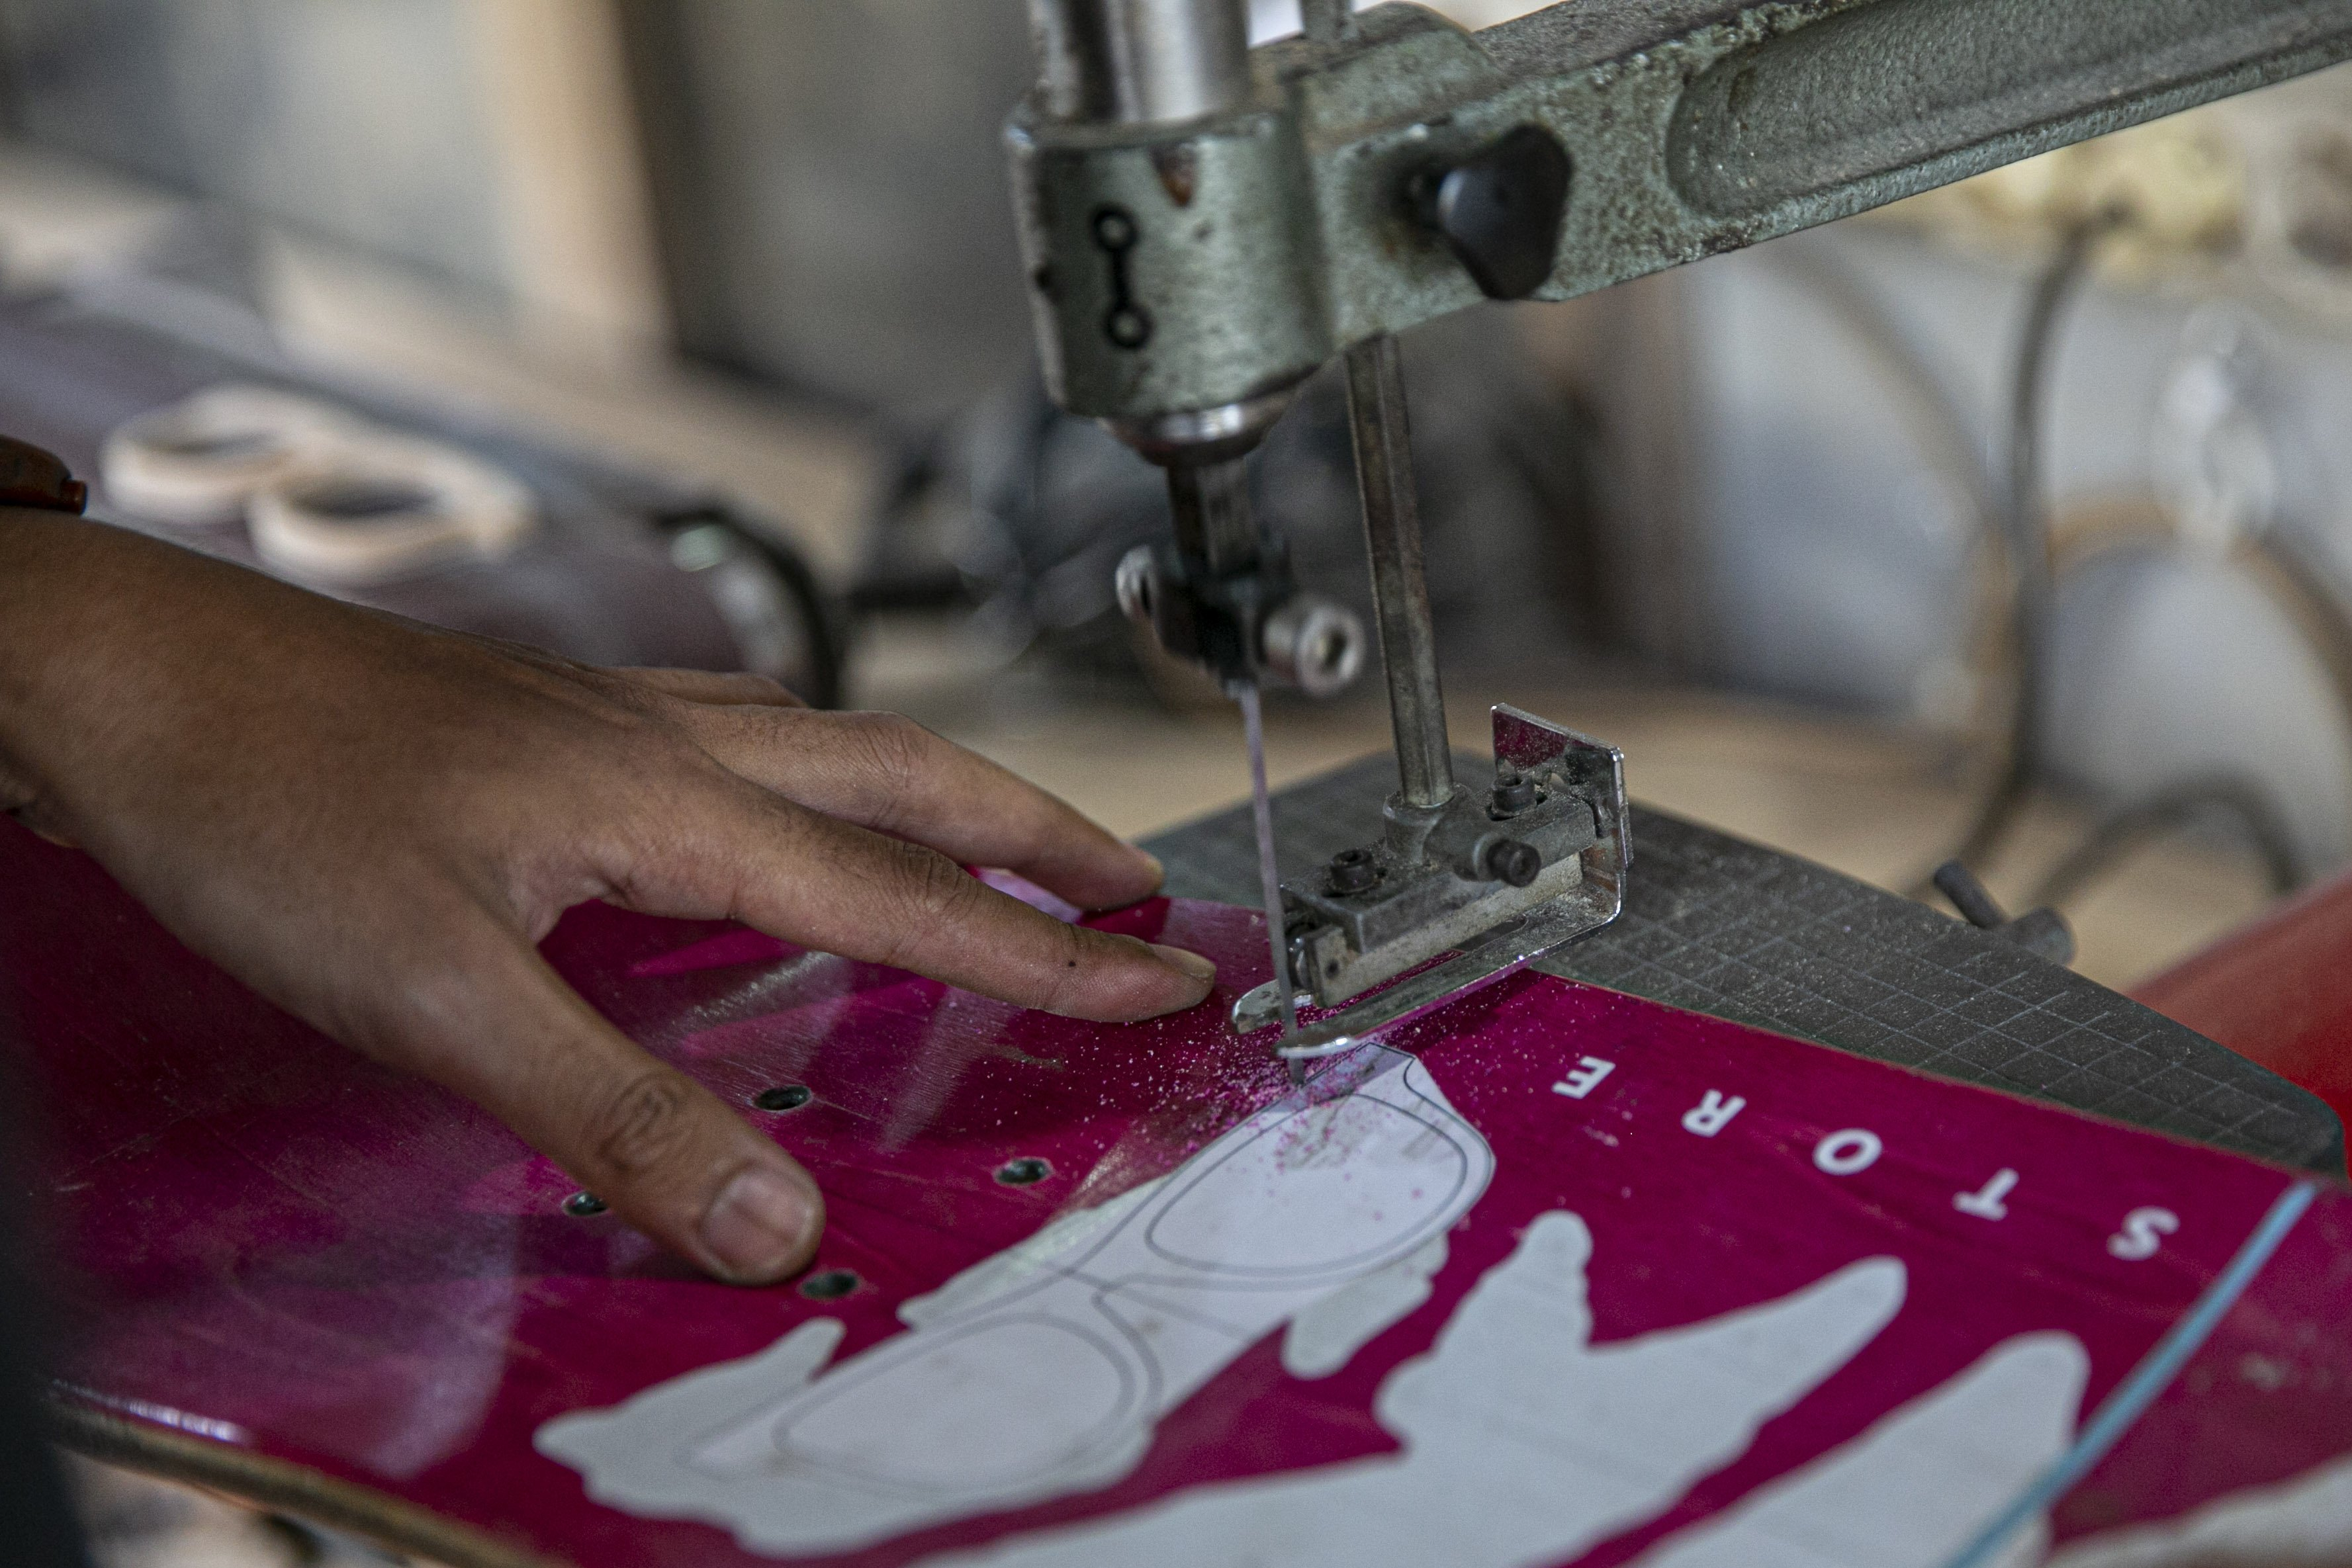 Pendiri brand kacamata Kabau, Reynanto Akhmad Aditya (35) bersama rekannya Bonny Andrew (34) saat menyelesaikan pesanan kacamata kayu di workshopnya di kawasan Kramat Jati, Jakarta Timur, Kamis (1/10/2020). Dibuat dari limbah papan skate, produk kacamata tersebut dibandrol dengan harga mulai dari Rp. 1.200.000 hingga Rp. 1.500.000. Tidak hanya menyasar pasar lokal produk kacamata kabau juga sudah merambah ke pasar mancanegara seperti Australia, Amerika, Swiss, dan Jepang.